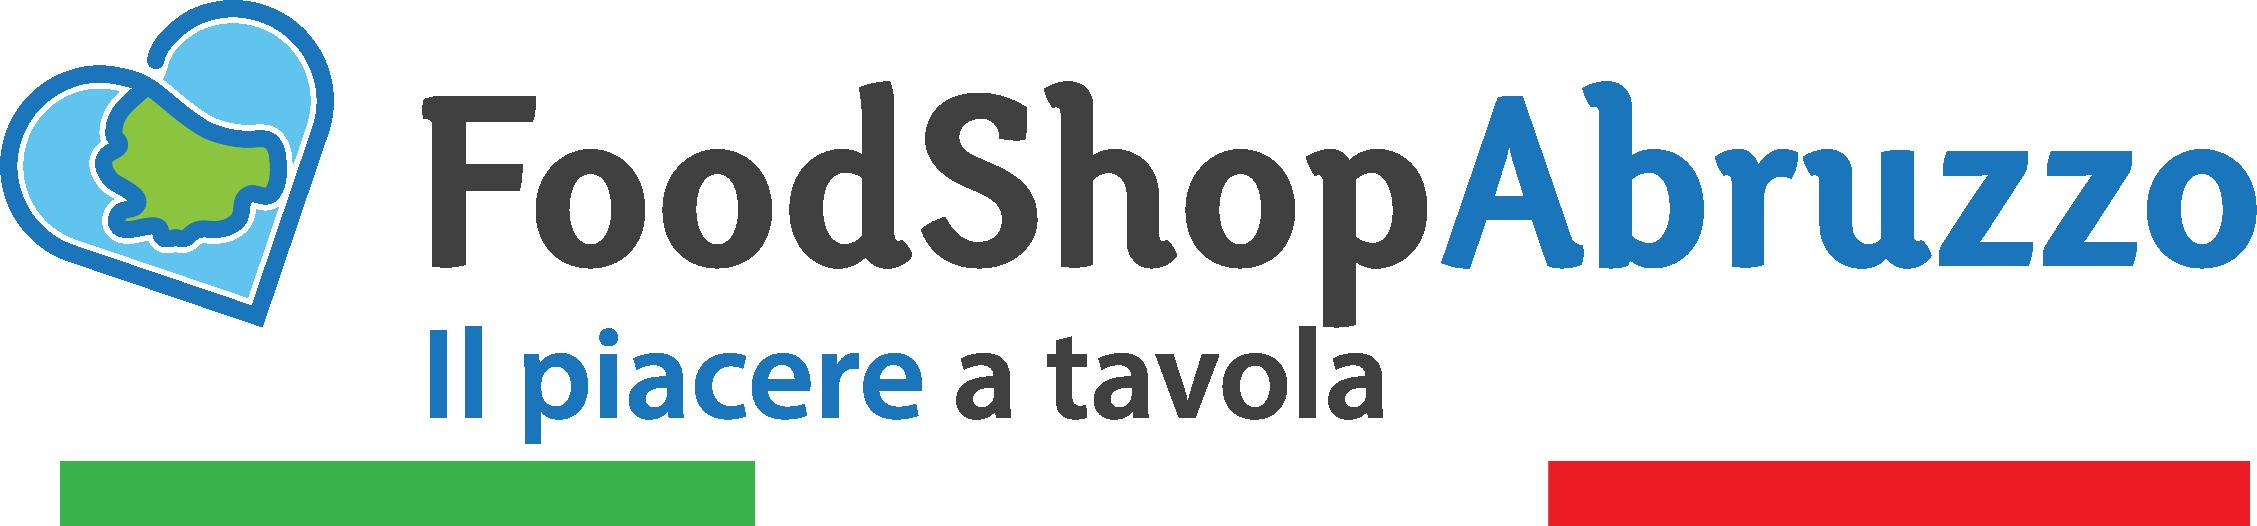 FoodShop Abruzzo